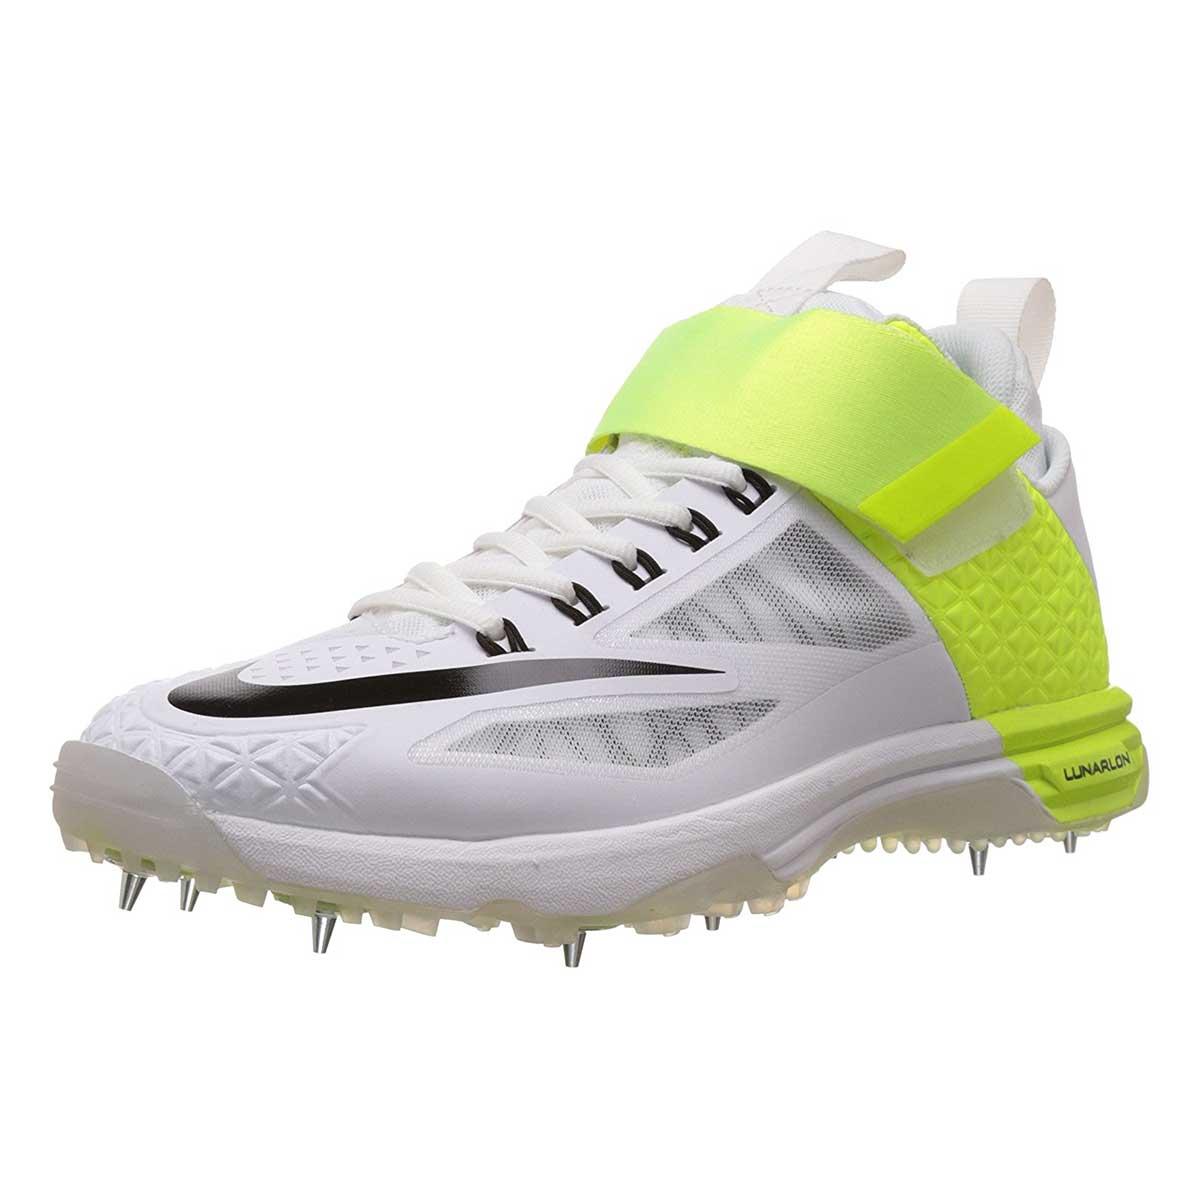 Buy Nike Lunar Accelerate 2 Cricket